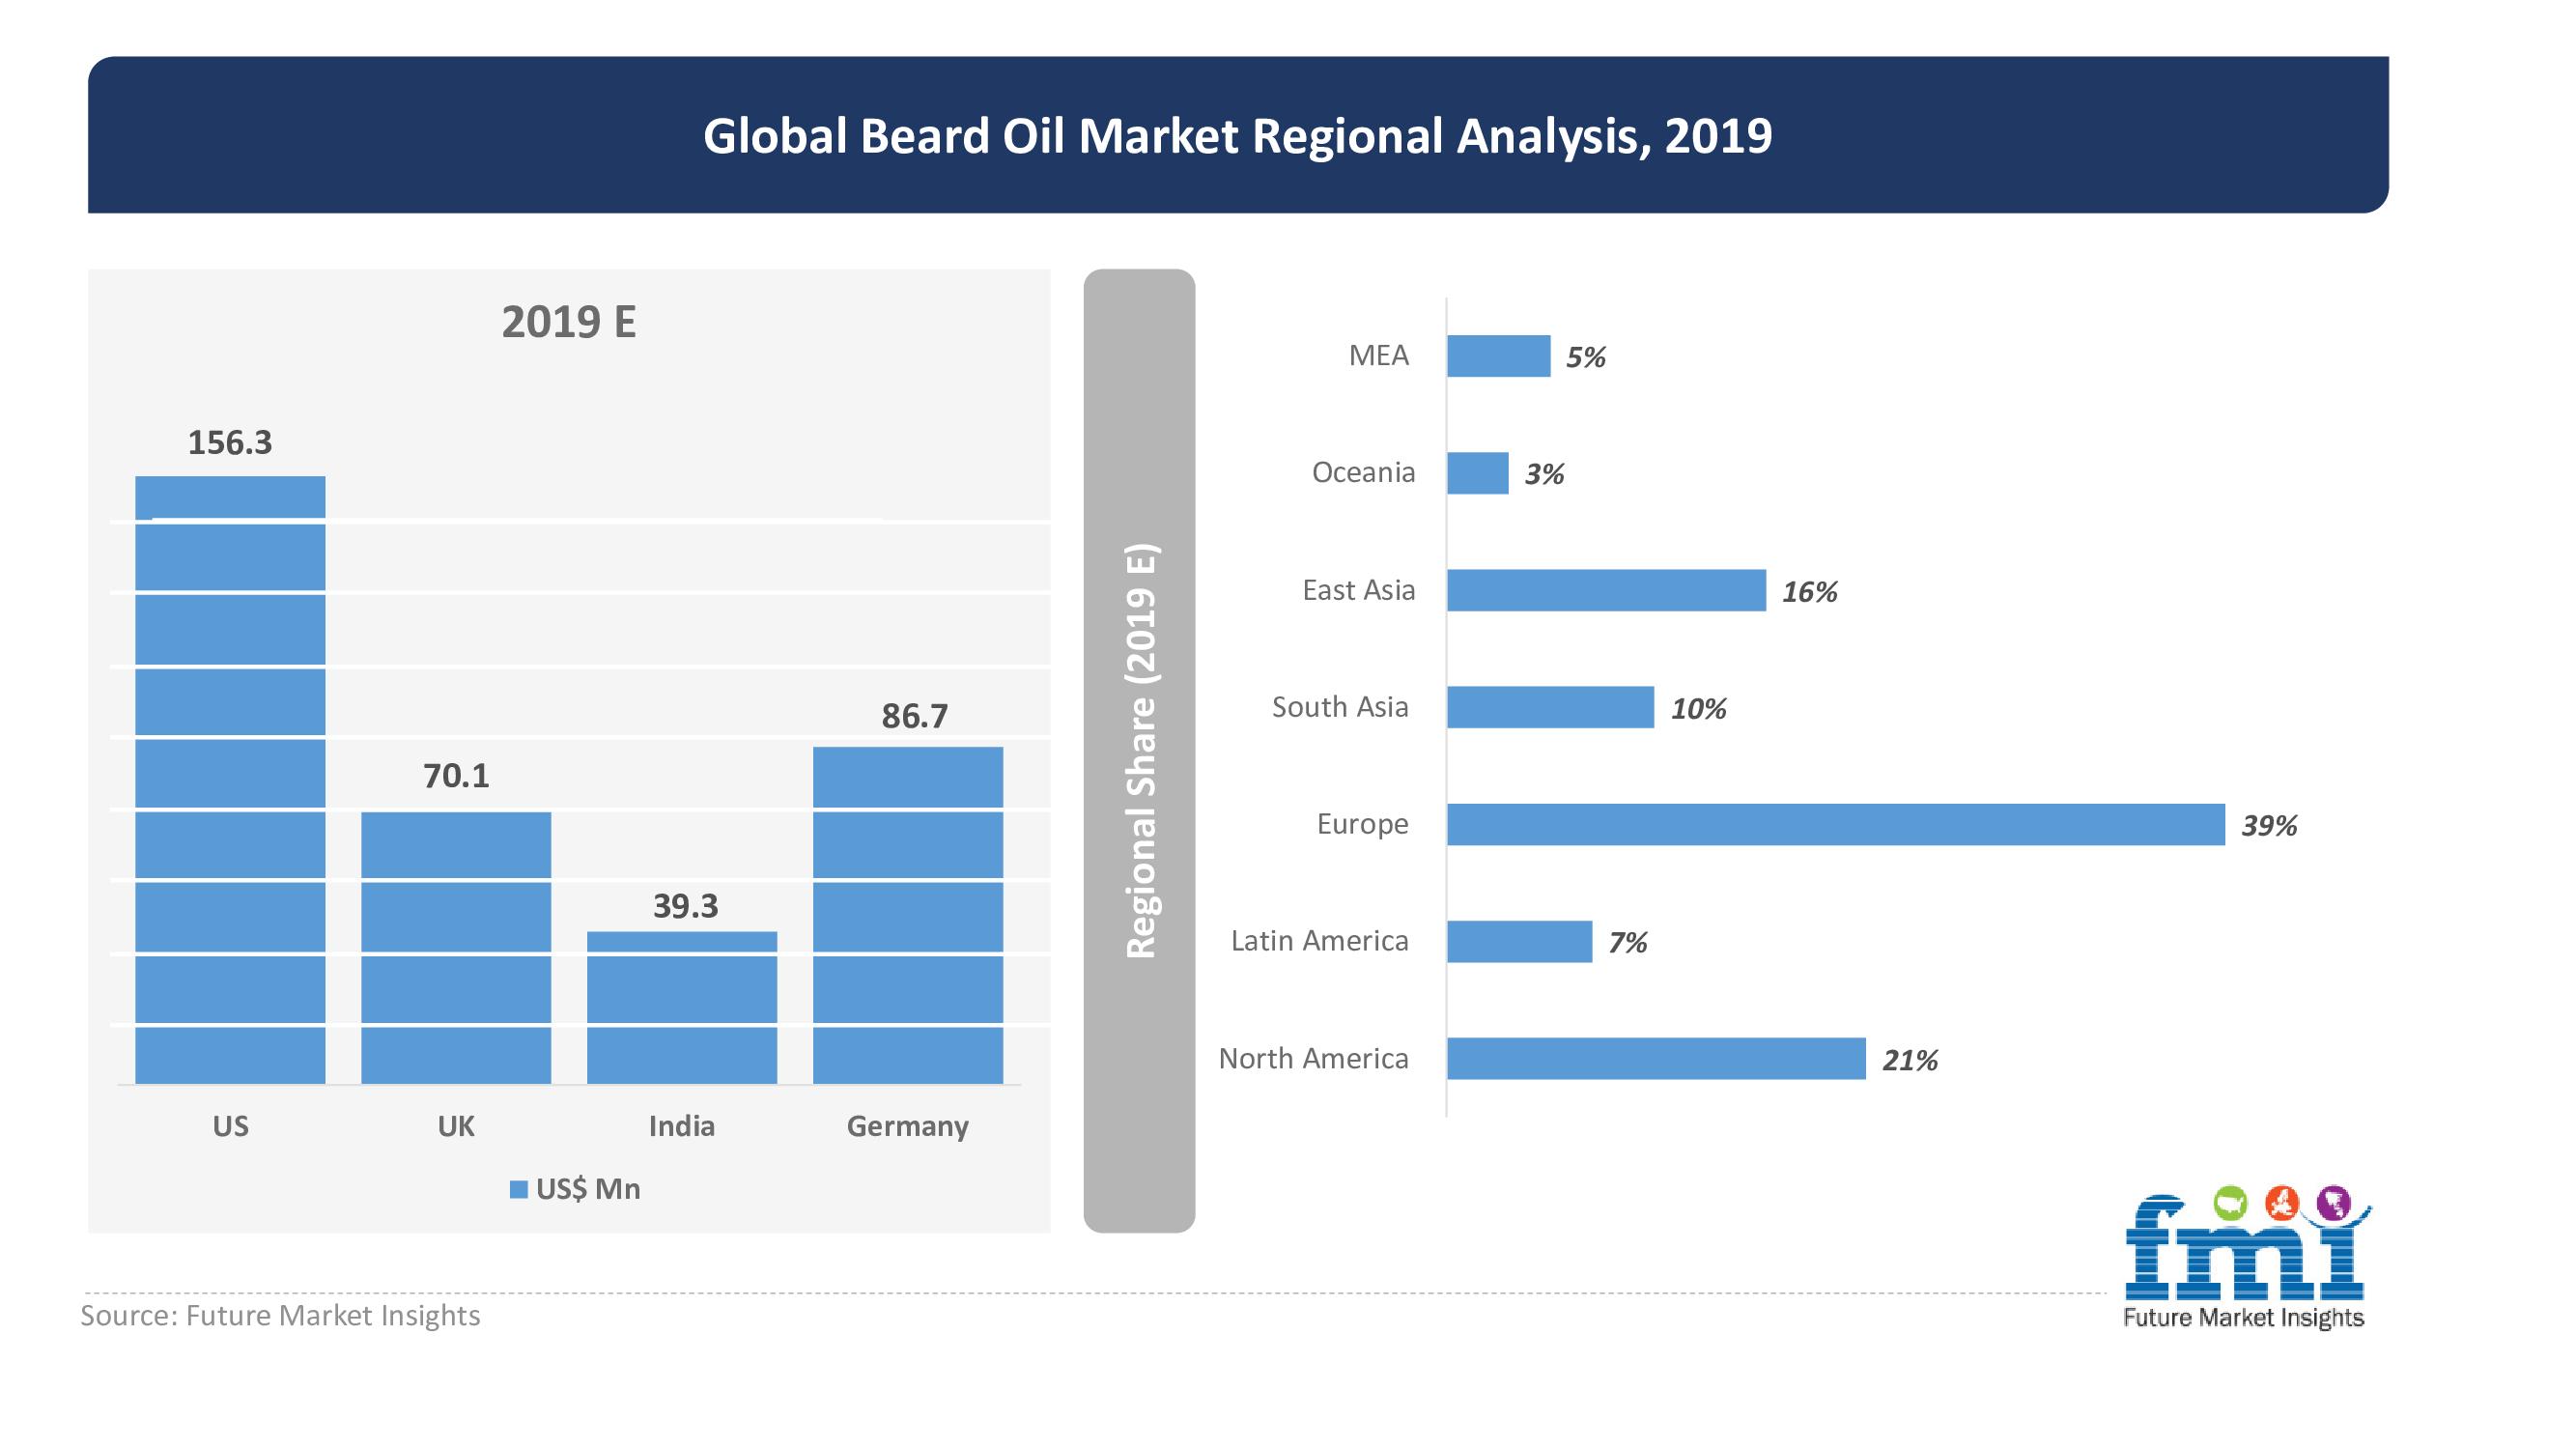 global beard oil market regional analysis 2019